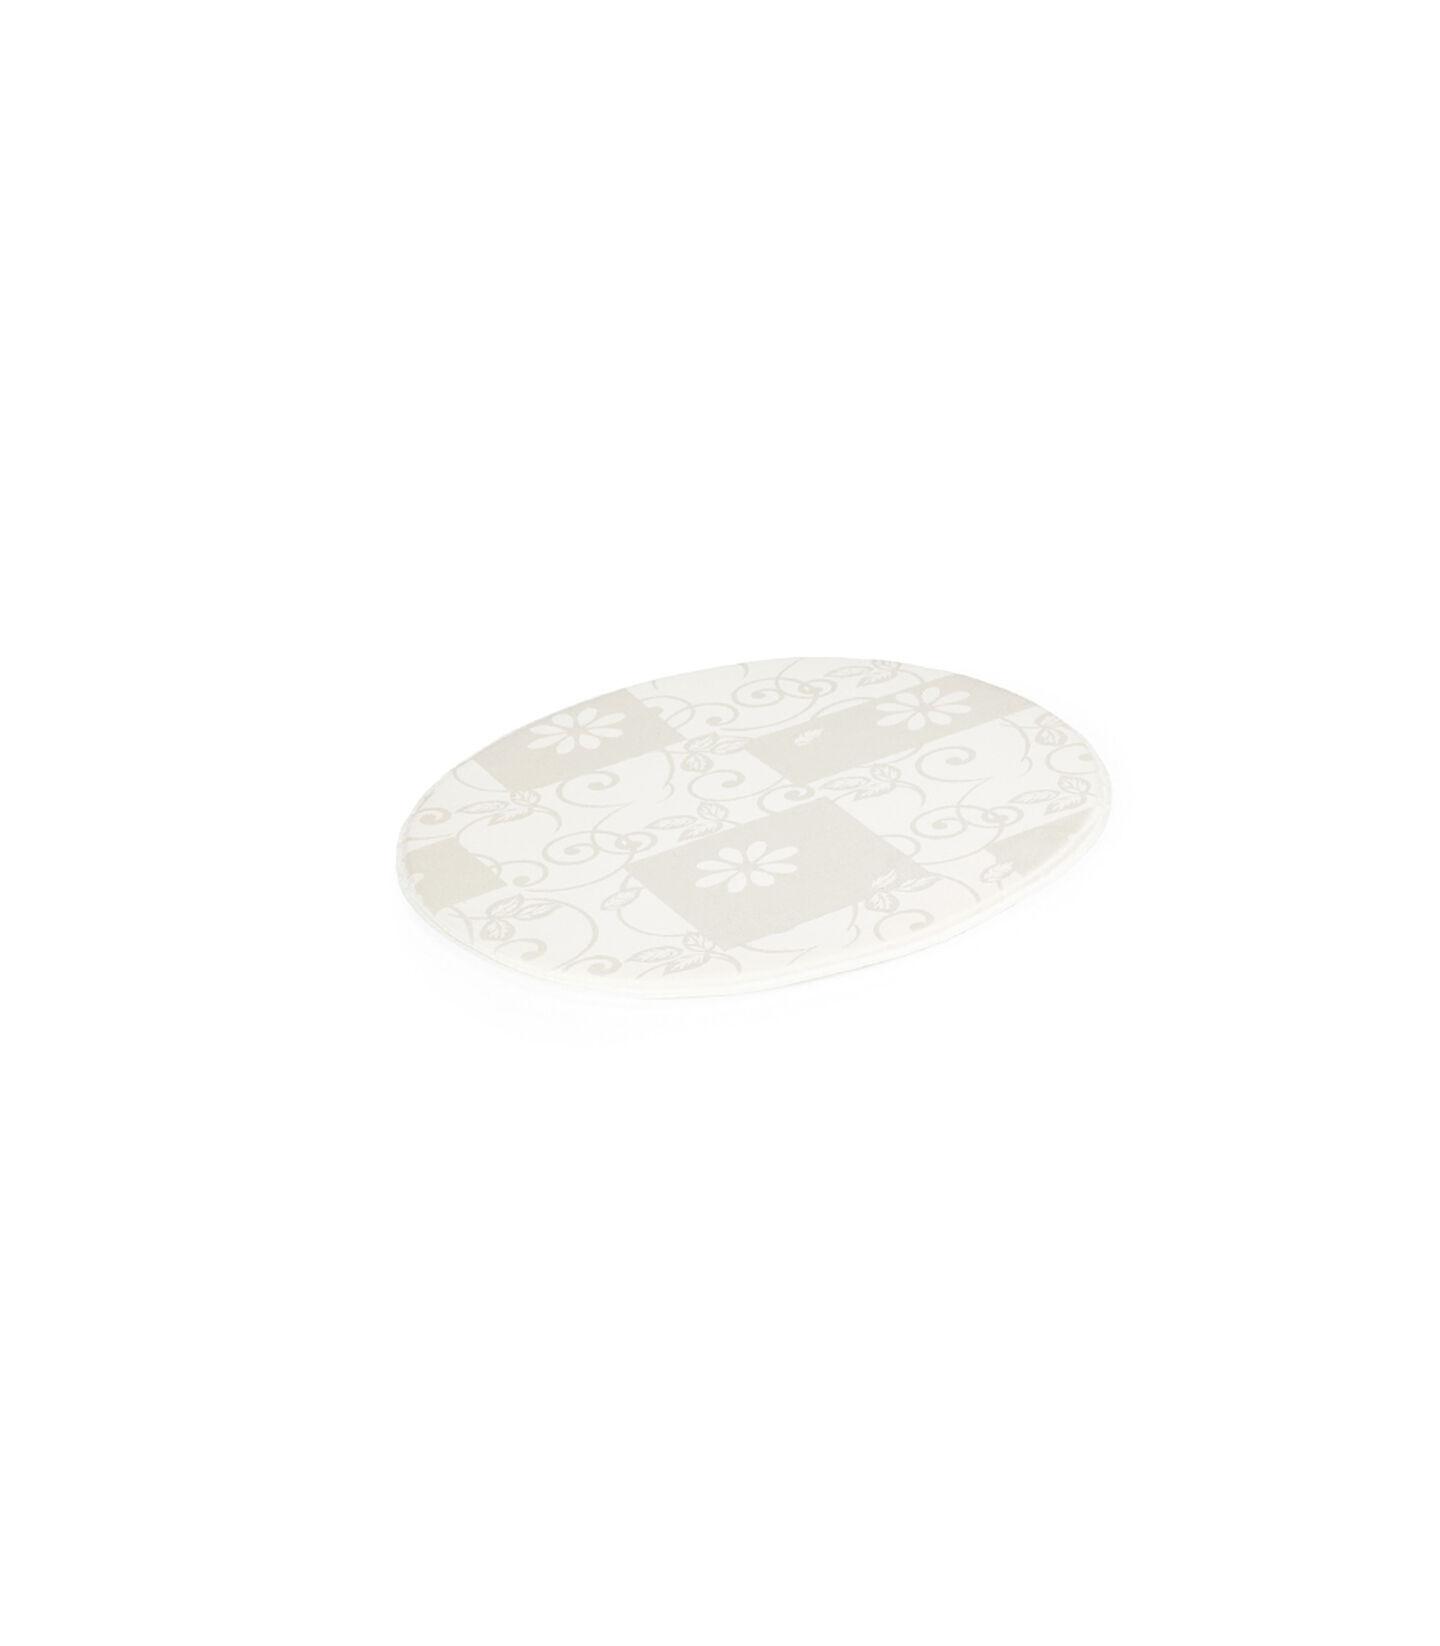 Stokke® Sleepi™ Mini Mattress, , mainview view 2